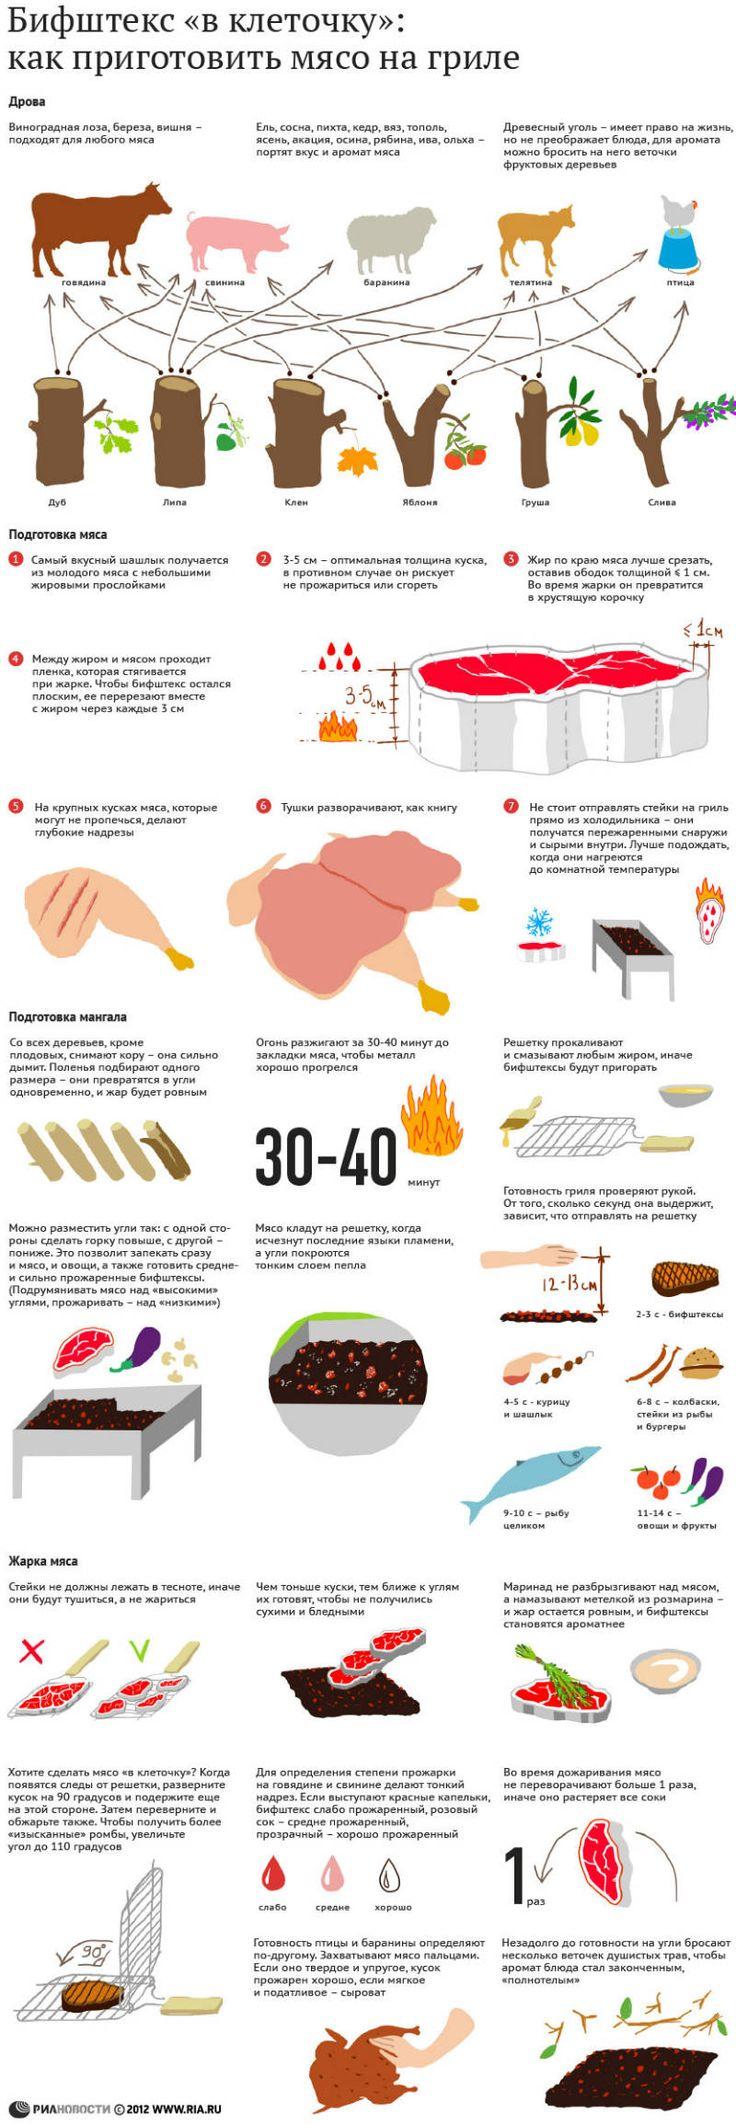 Как жарить мясо на гриле